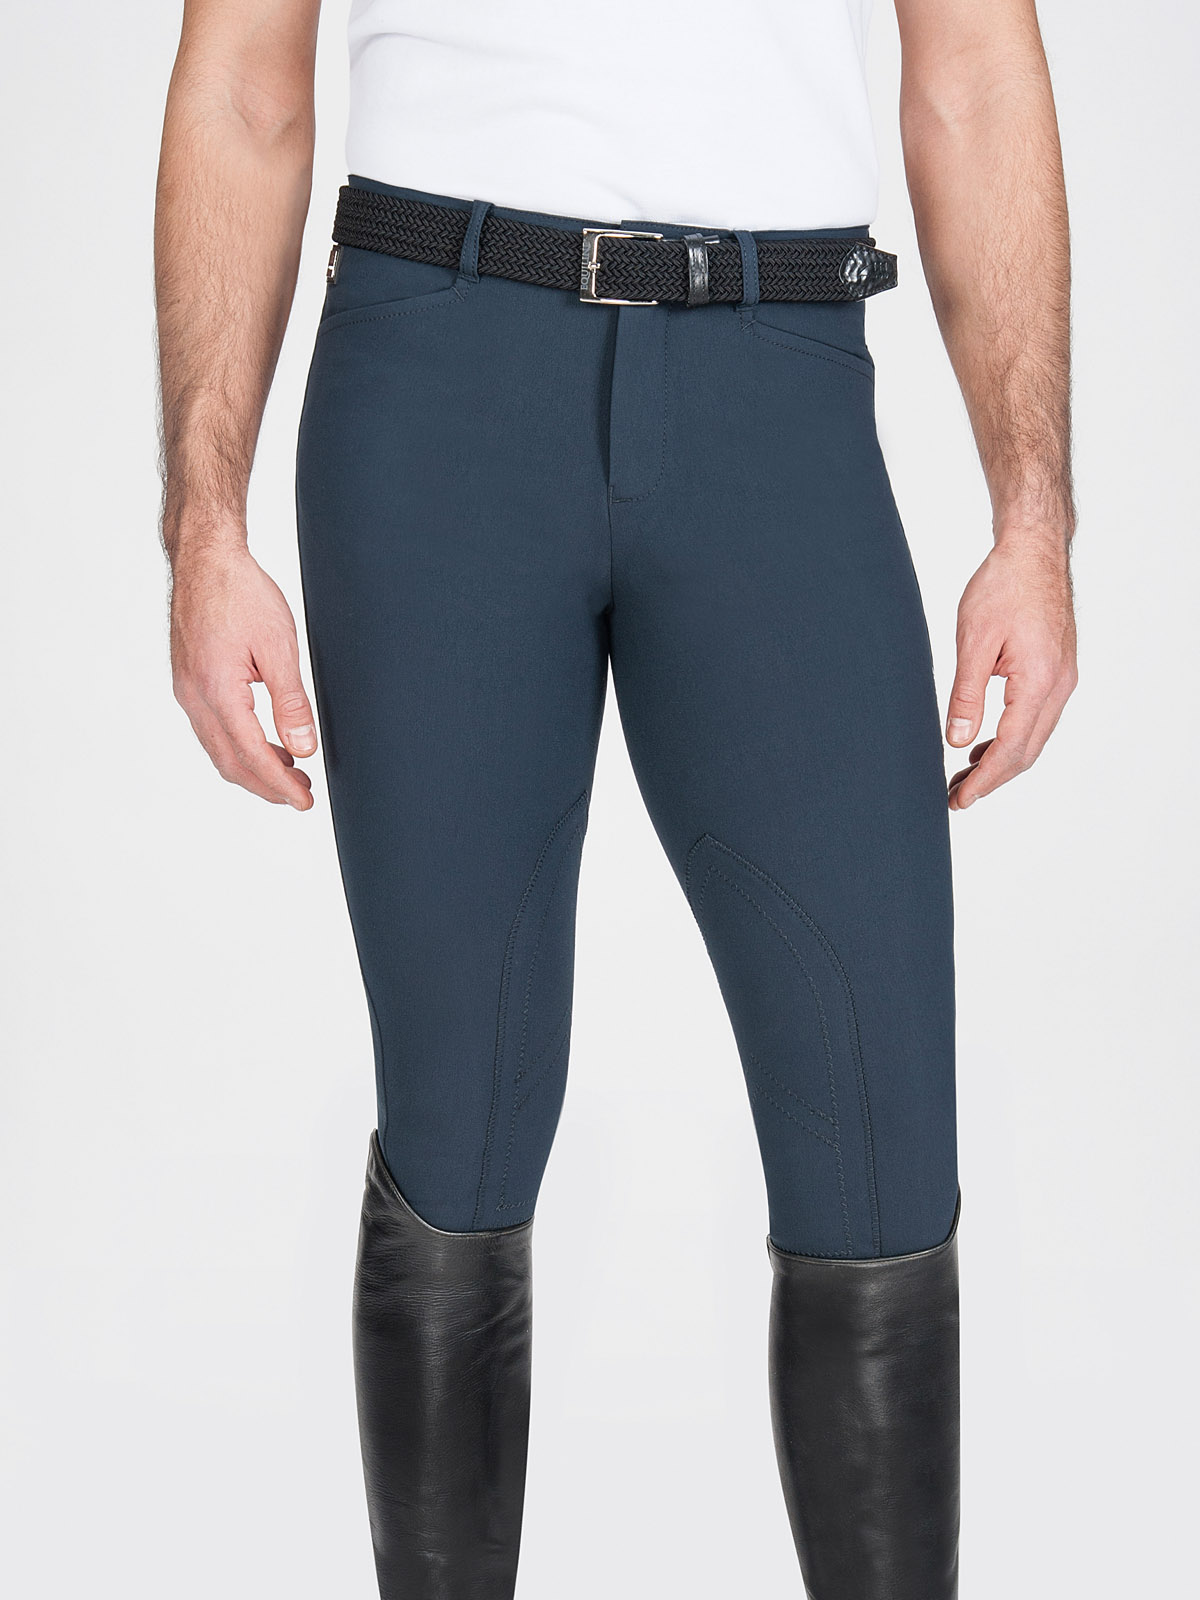 GRAFTON - Men's Knee Patch Riding Breeches 3